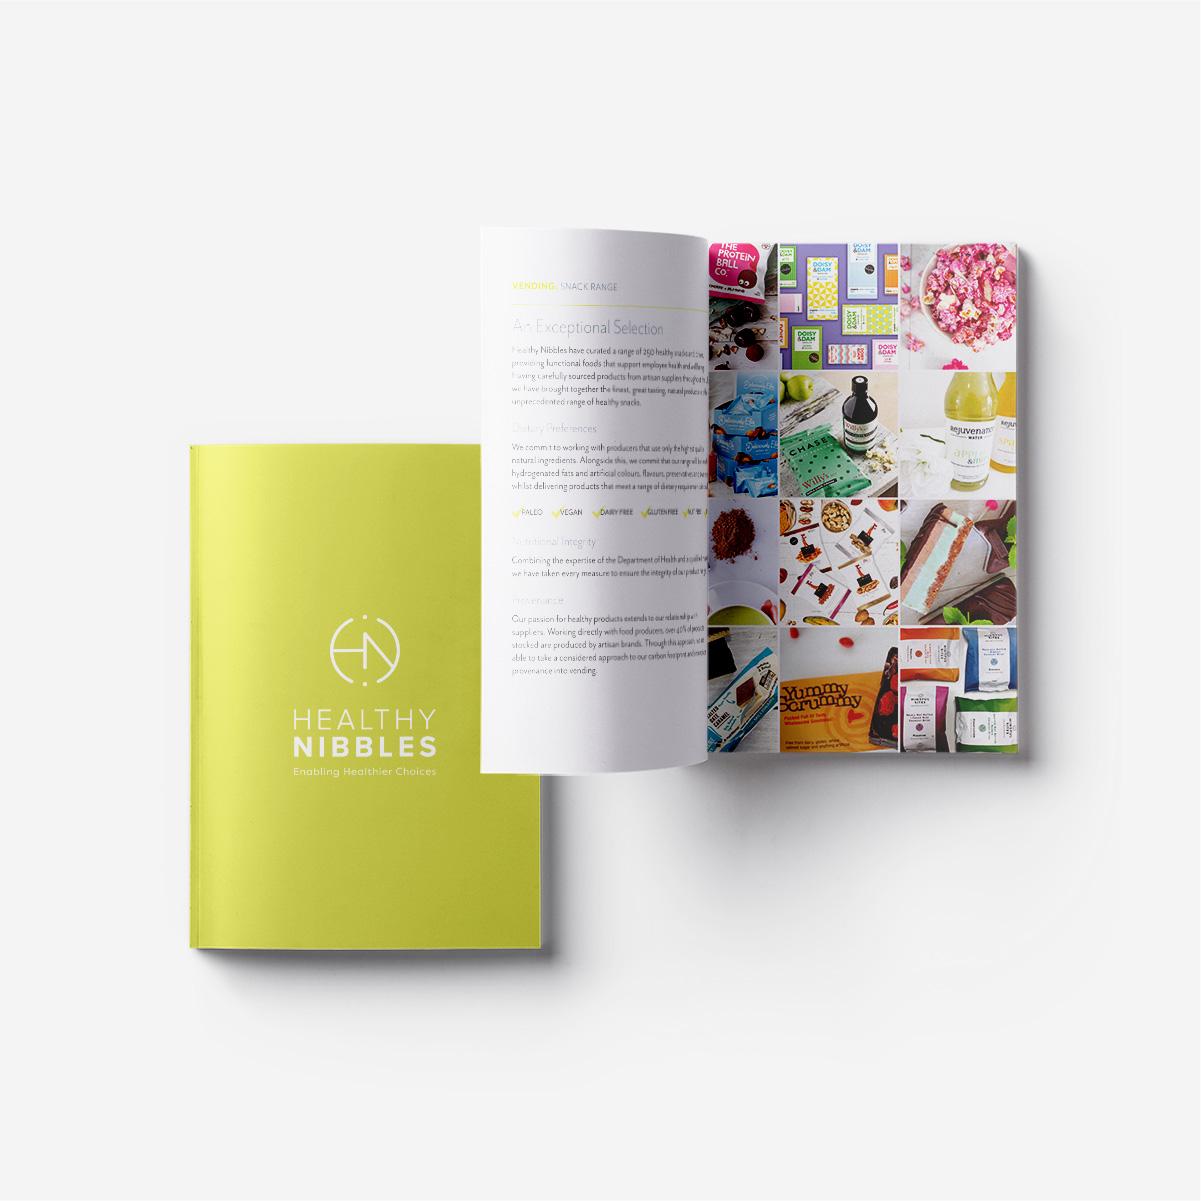 Healthy Nibbles Booklet Thumbnail